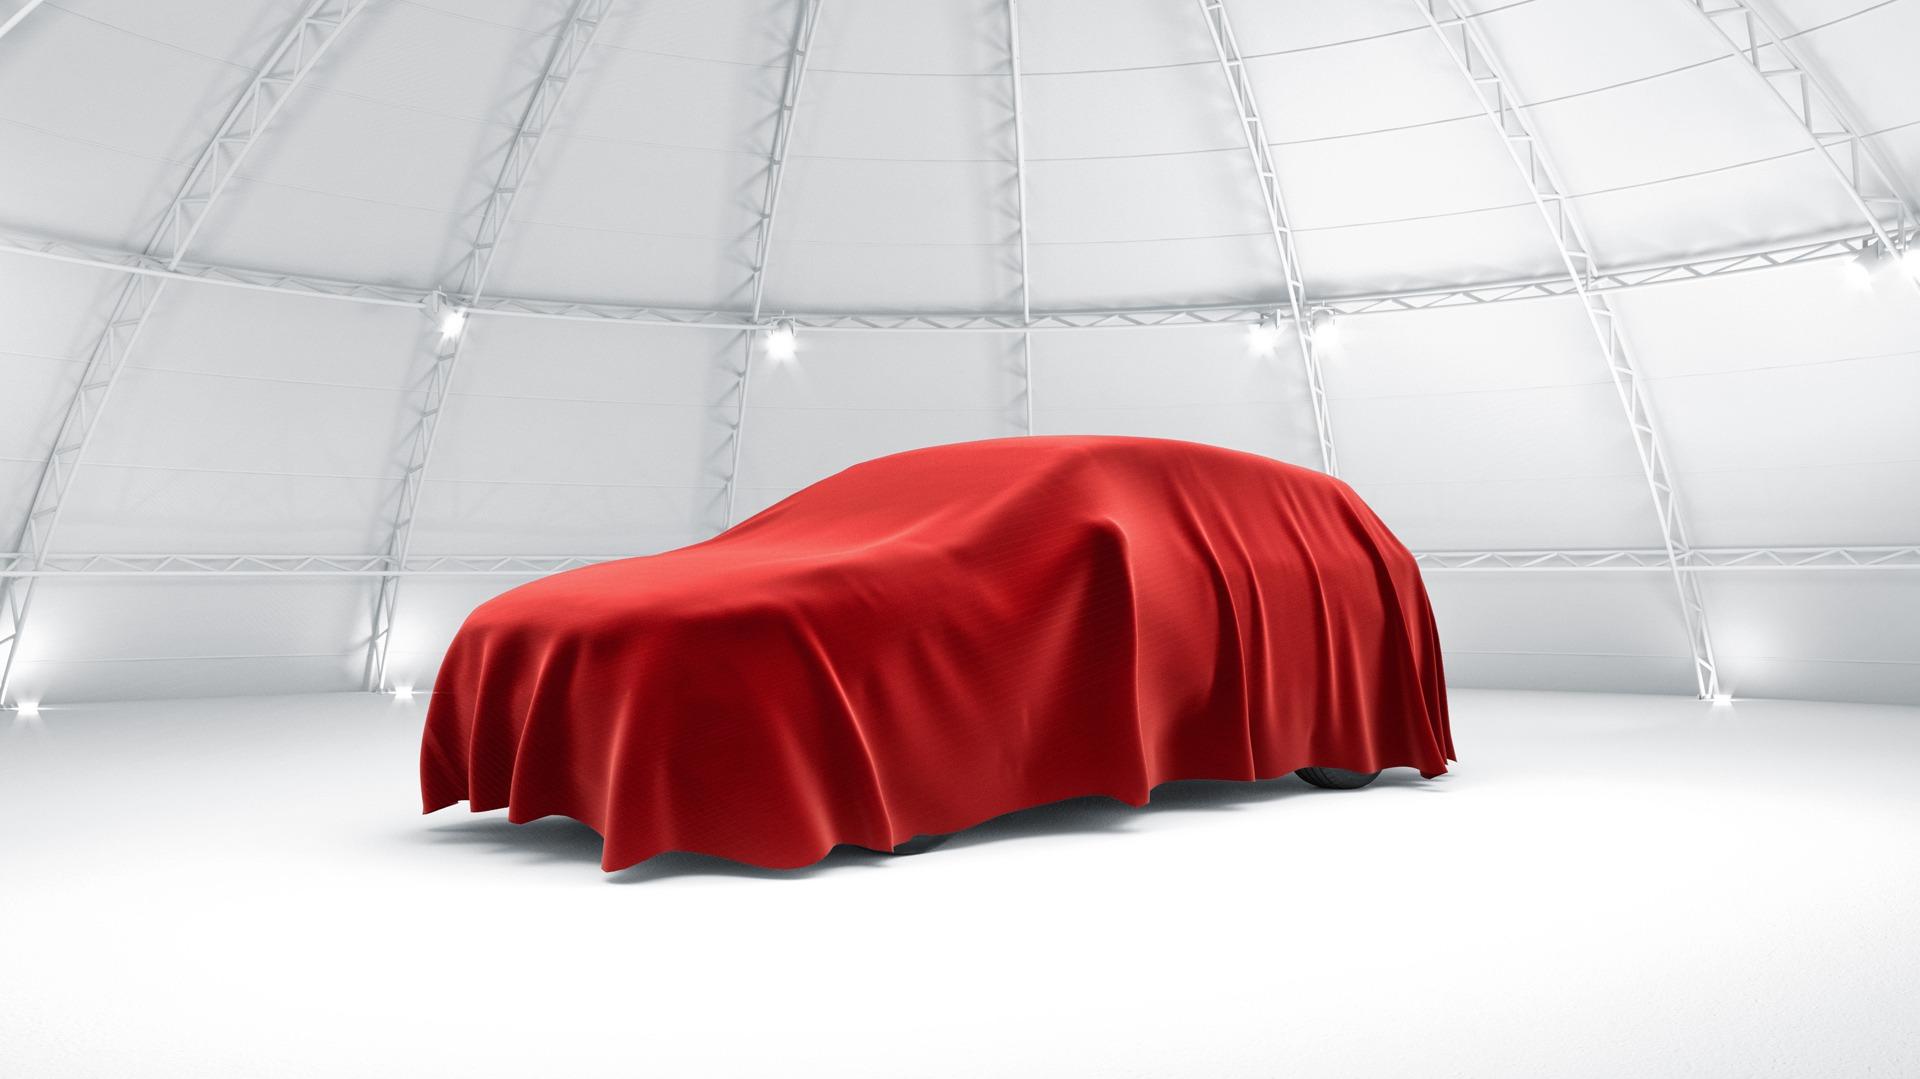 09 automodel